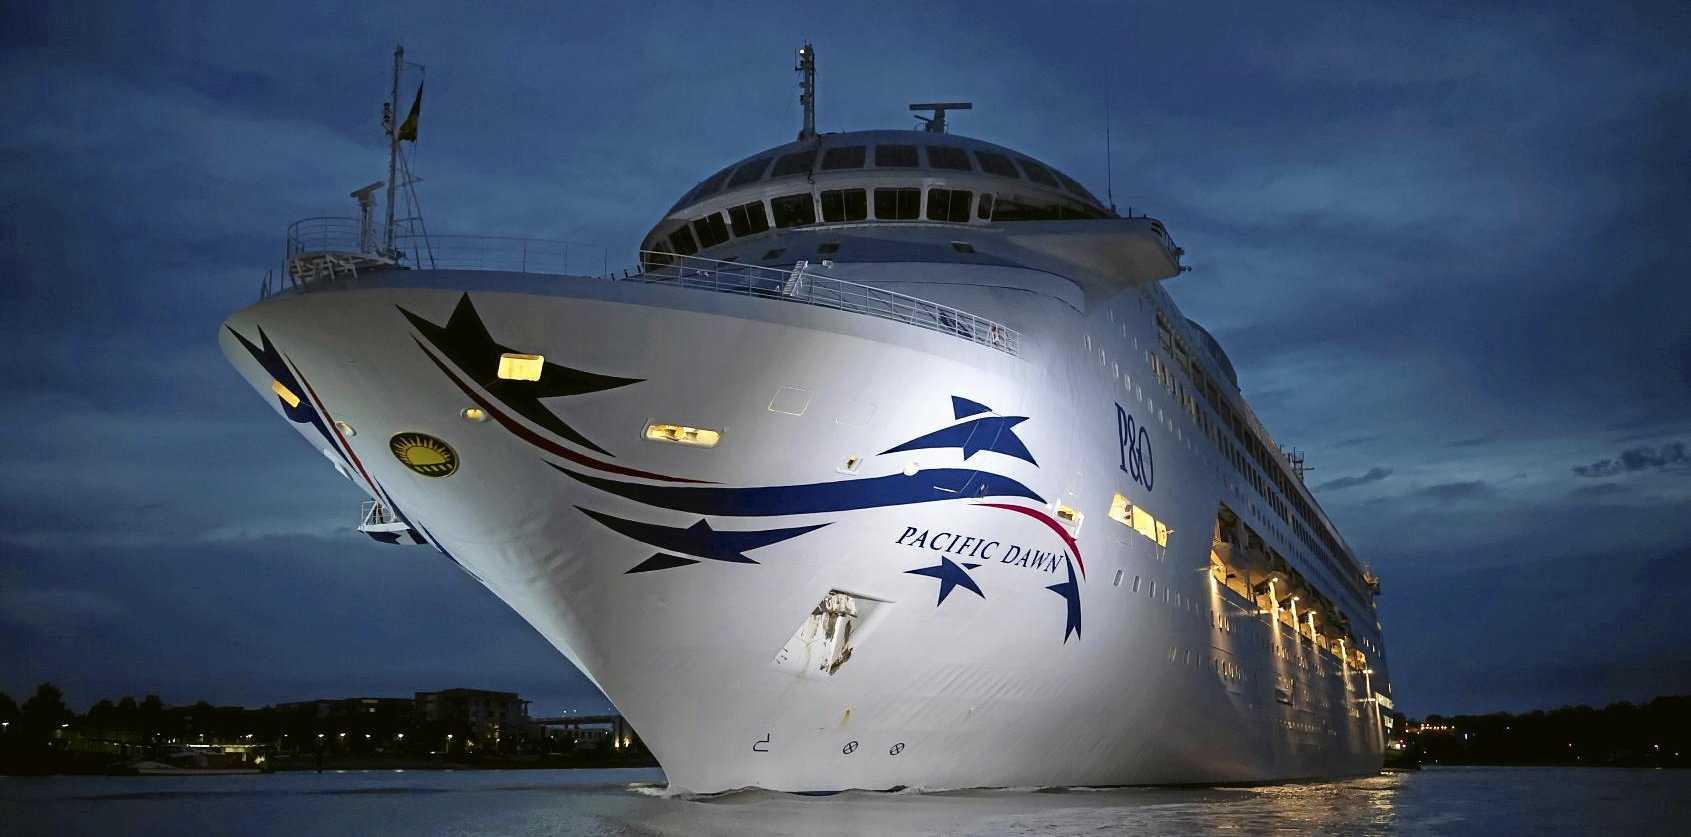 P&O Cruises' New-look Pacific Dawn Sails into Brisbane.